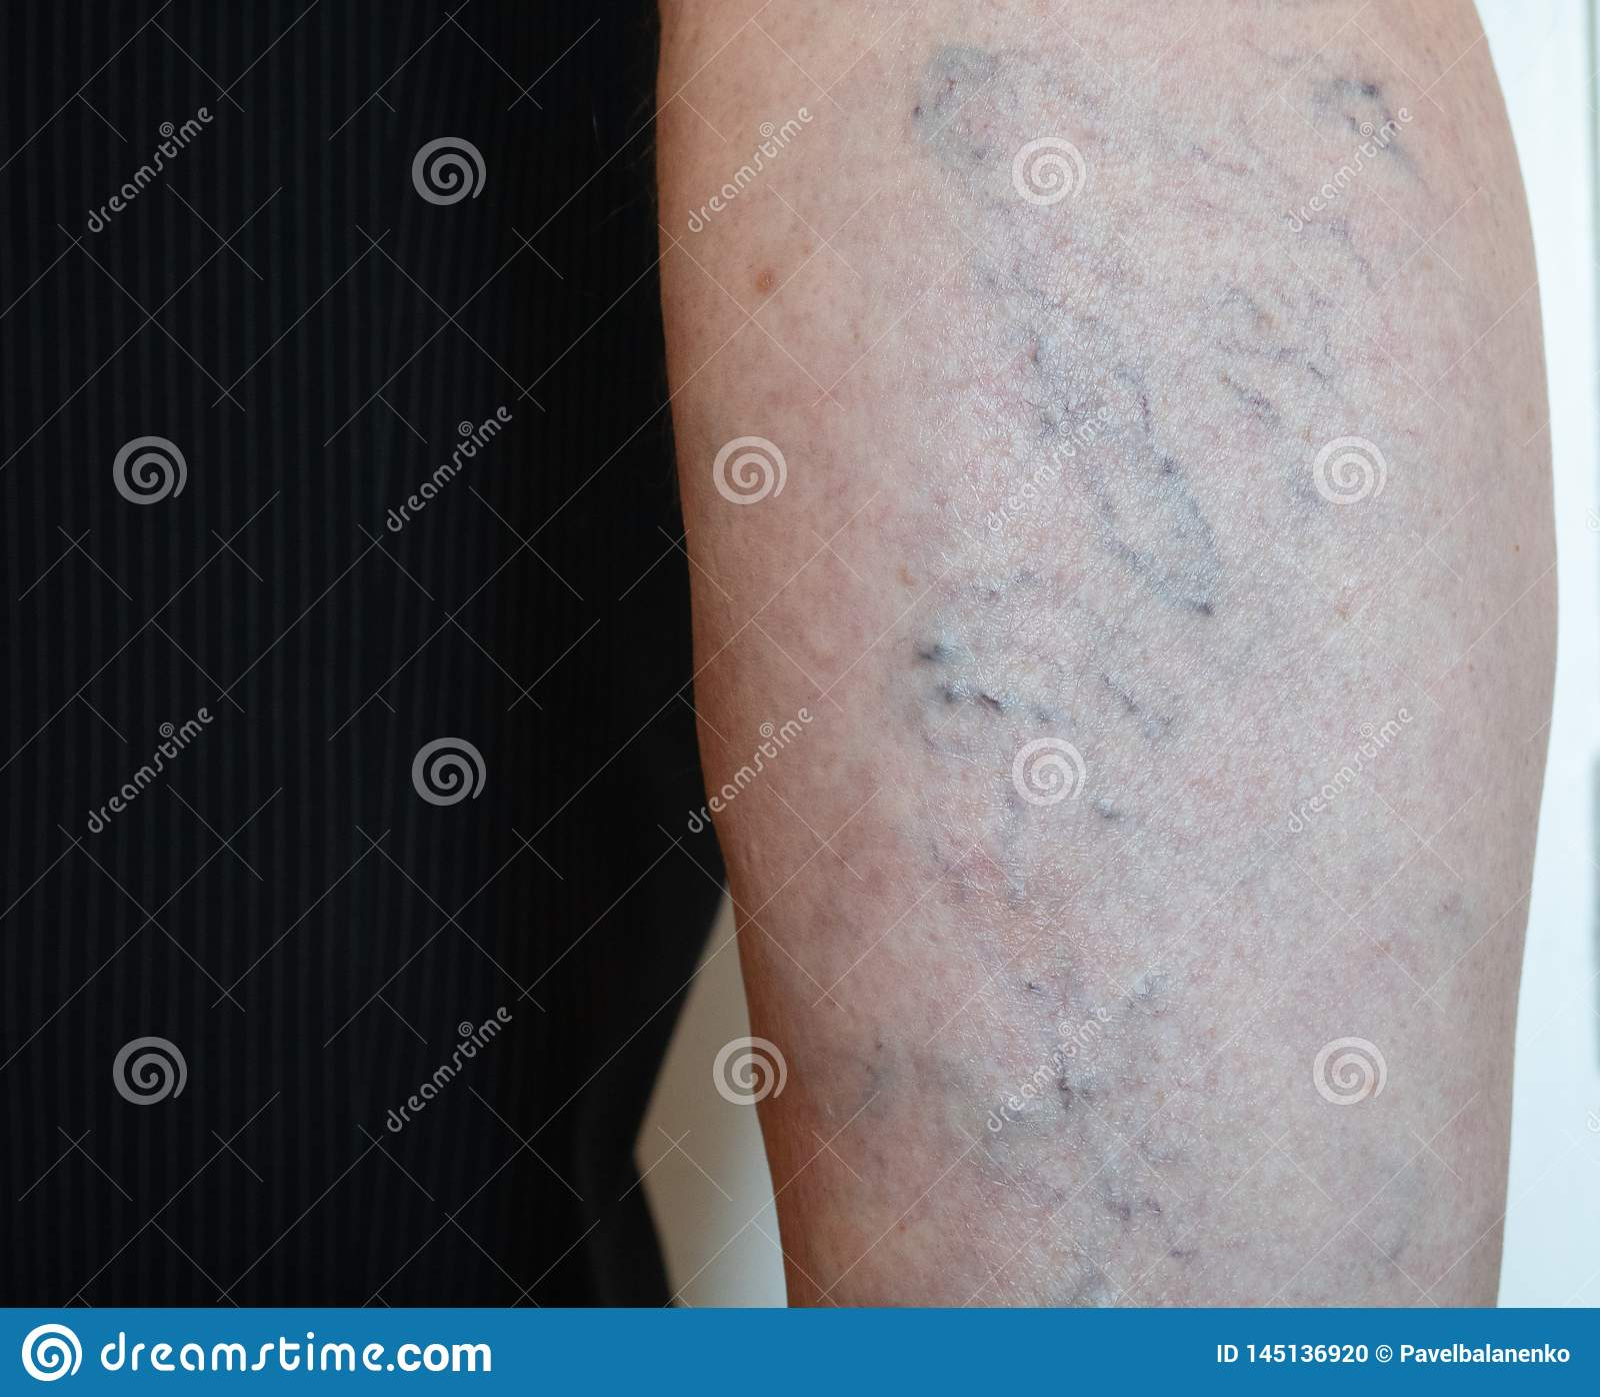 varicose capilary